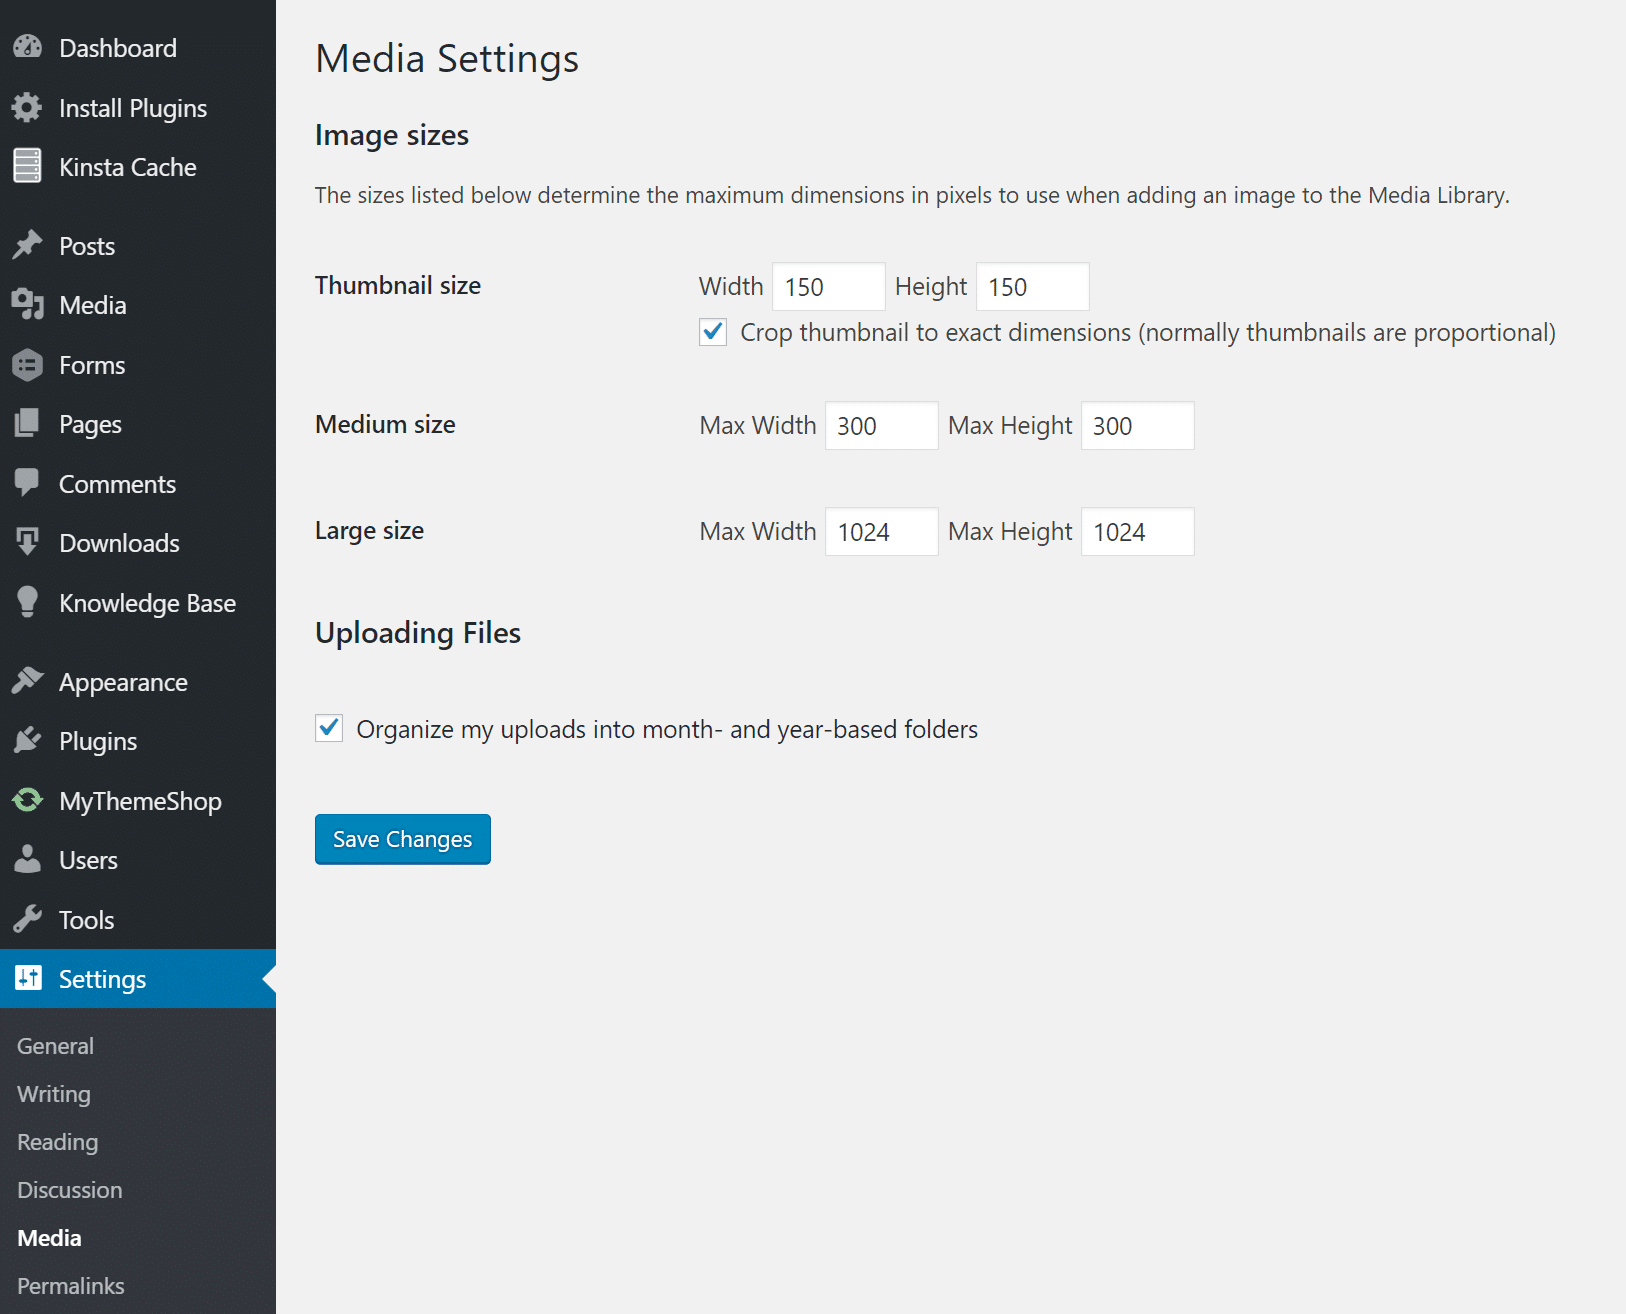 Configurações de mídia WordPress